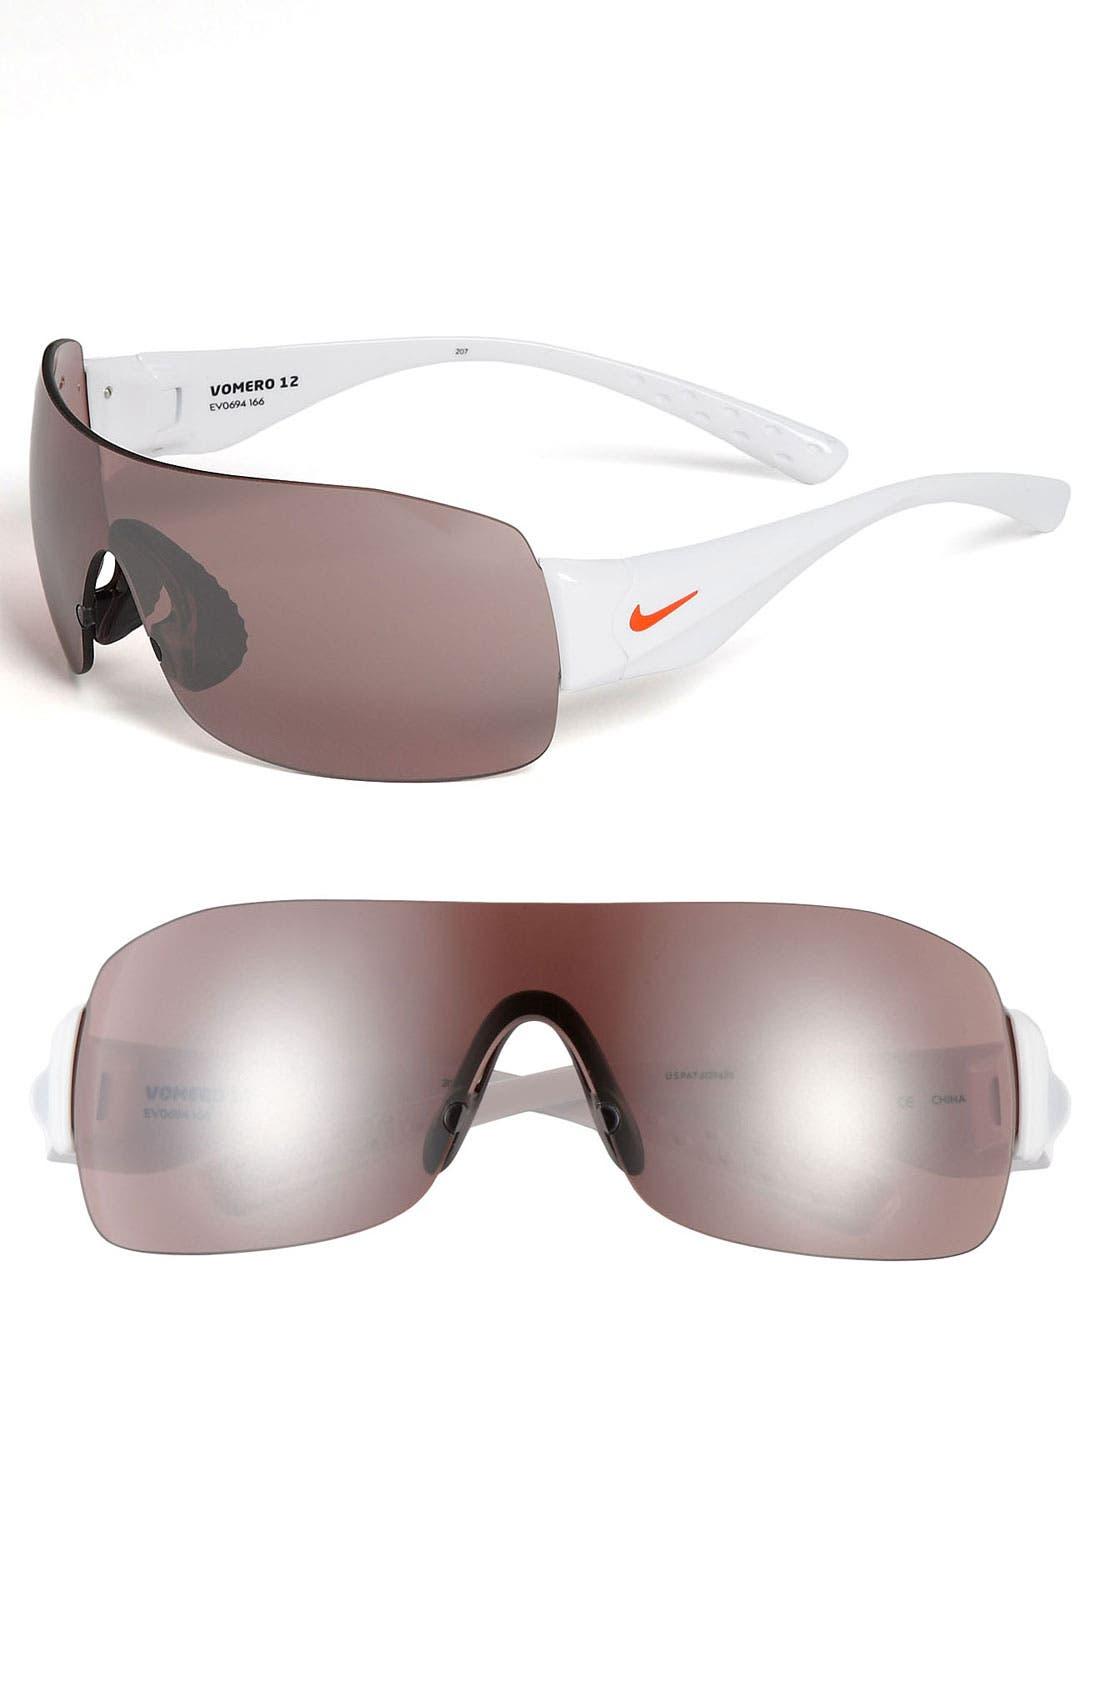 Alternate Image 1 Selected - Nike 'Vomero 12.E' 59mm Sunglasses